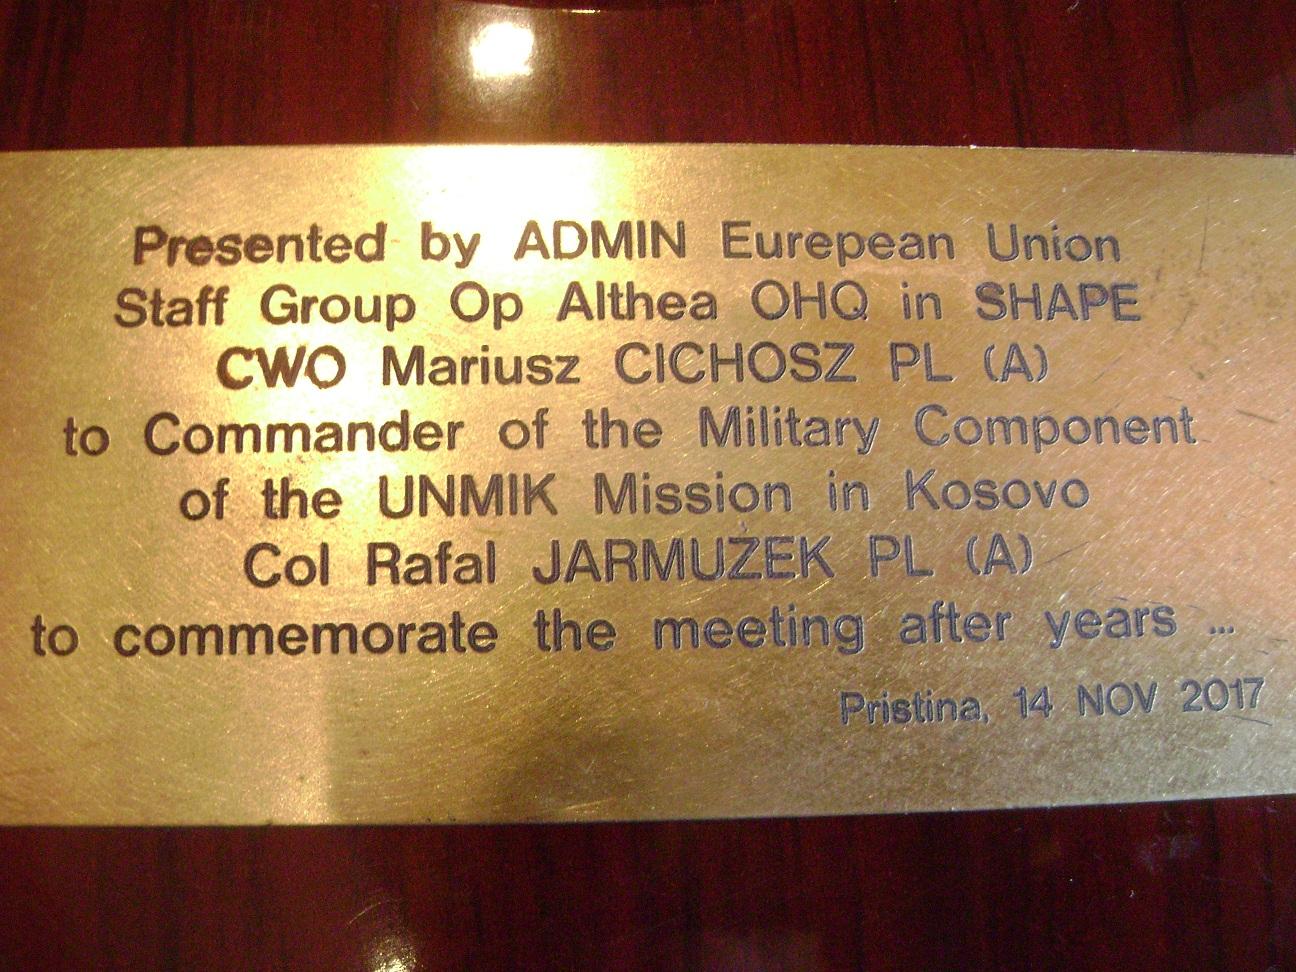 Plaketa_EU_OHQ_Operation_Althea_4.JPG